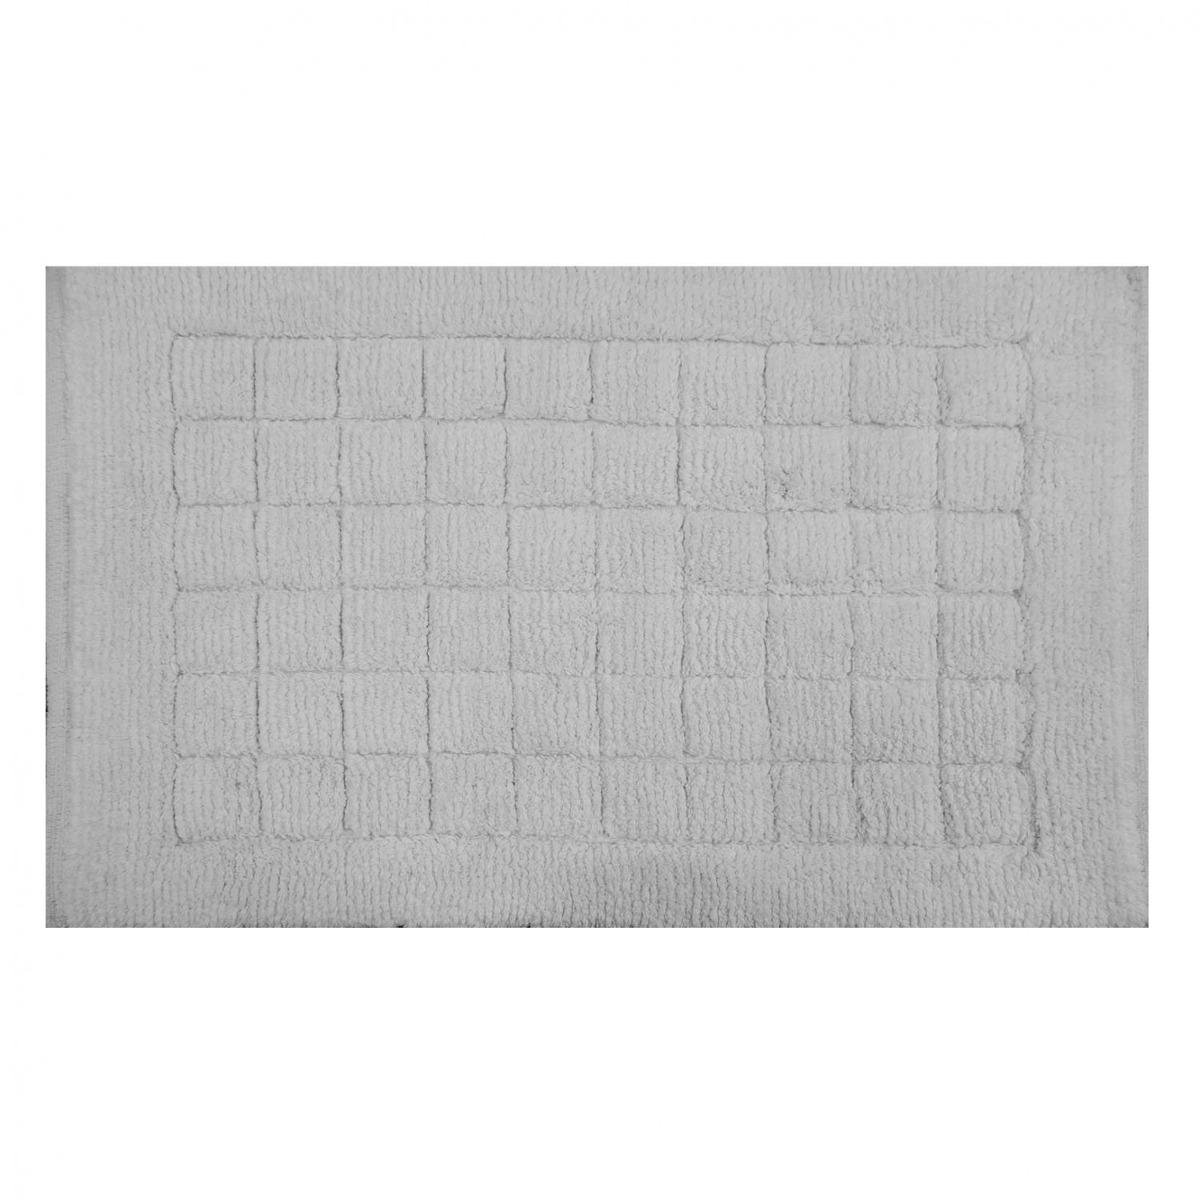 c4ca11387 tapete de banheiro liso hollywood niazitex 45cm x 75cm edwt. Carregando  zoom.